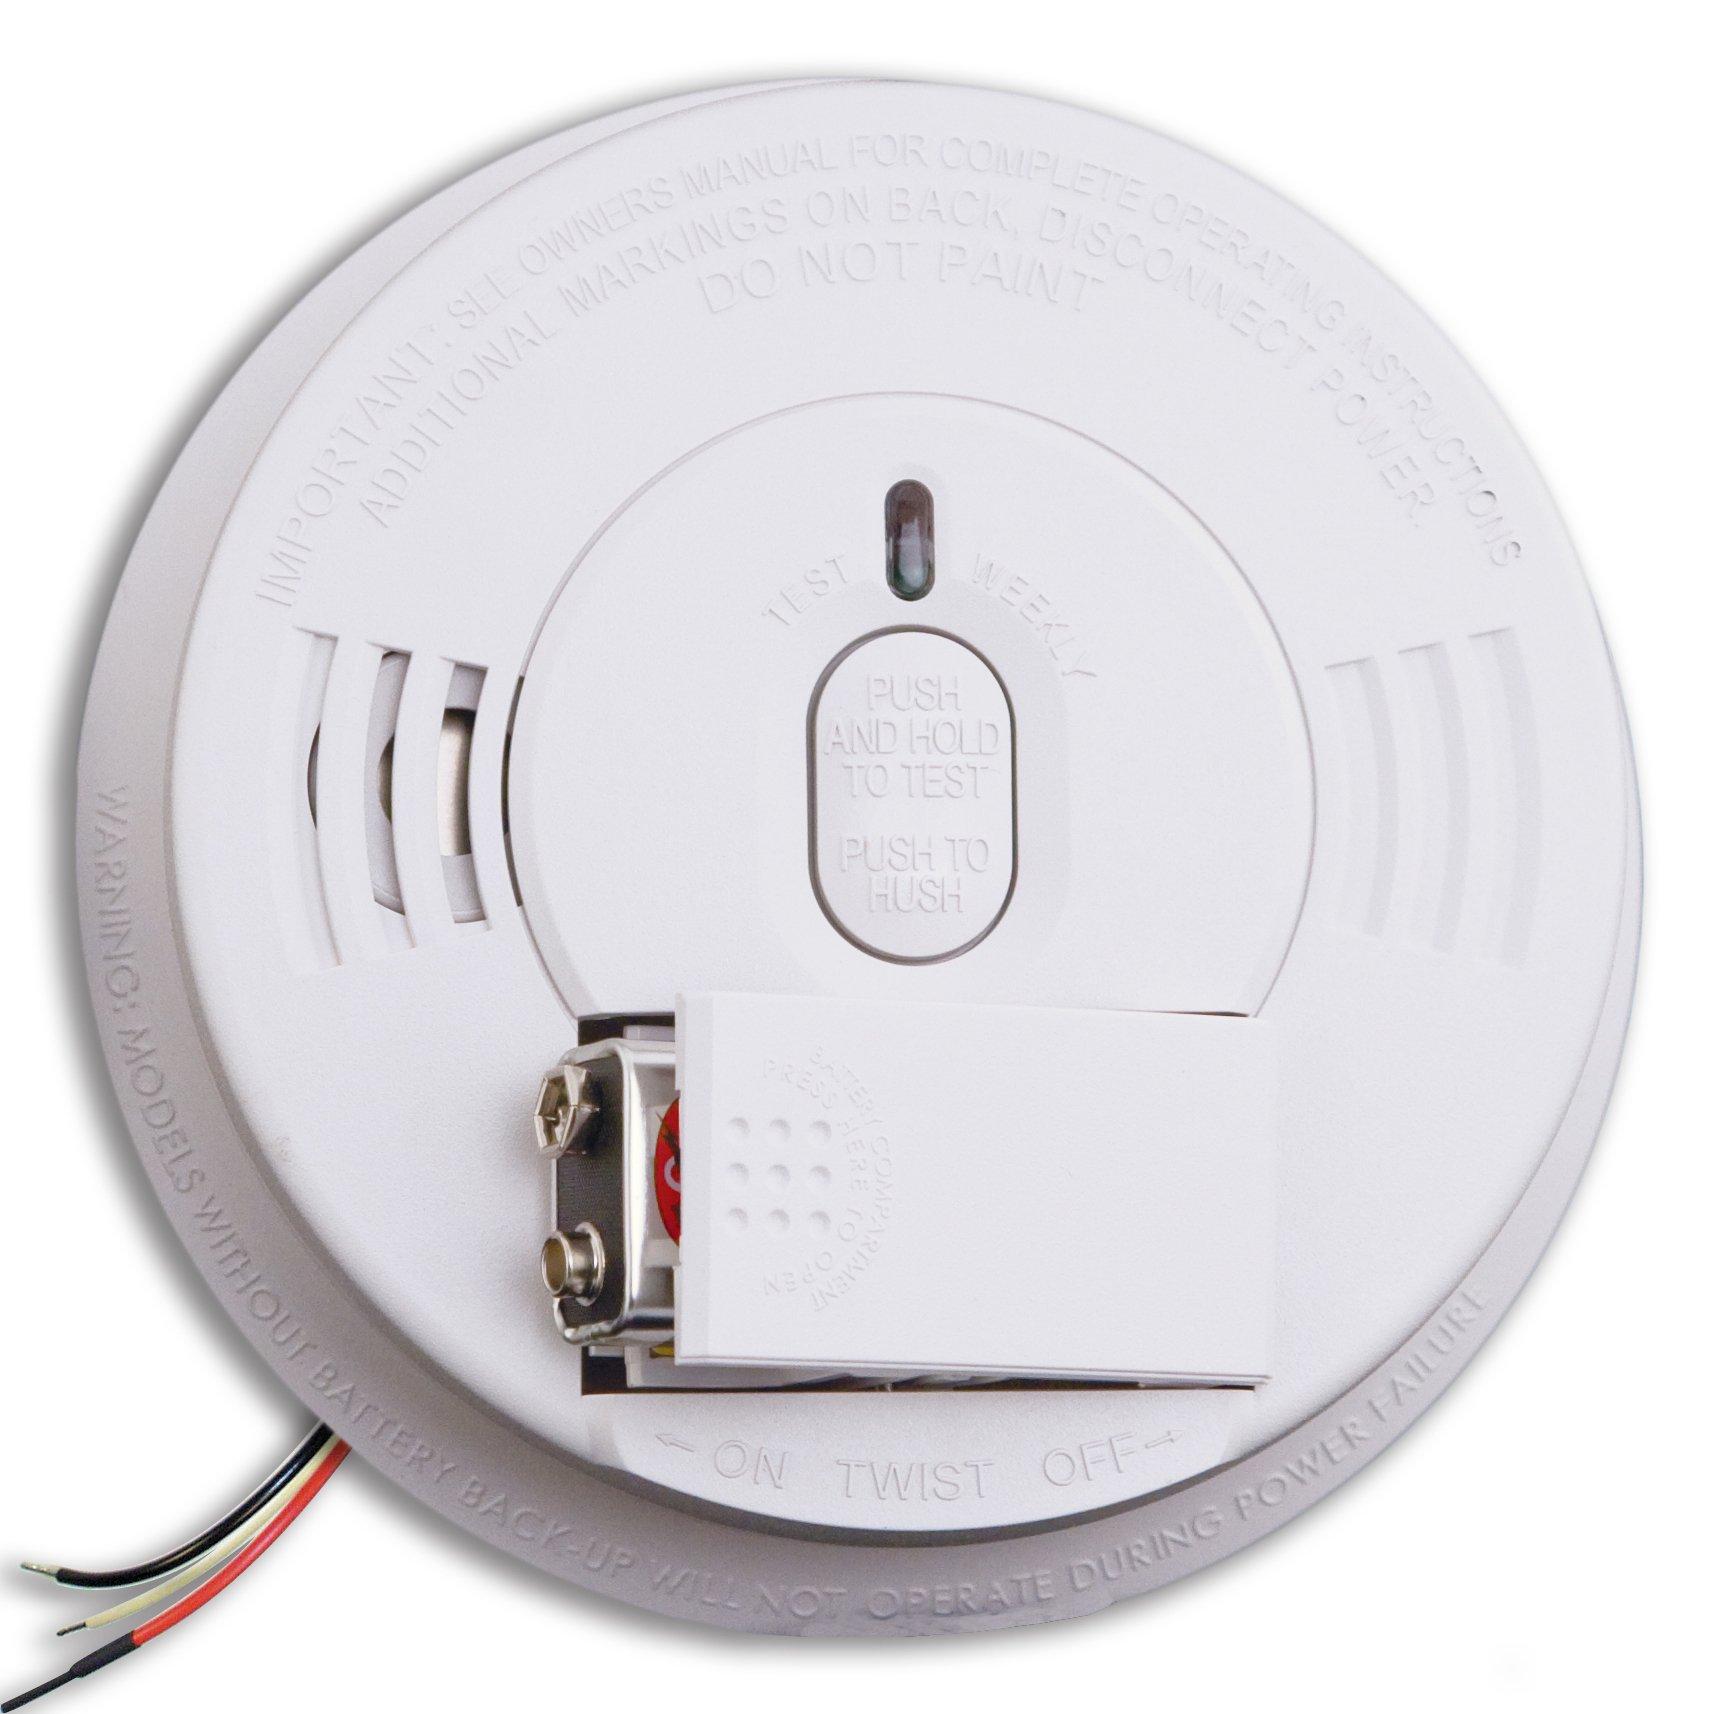 Kidde i12060 Hardwire with Front Load Battery Backup Smoke Alarm, 1 Pack, White